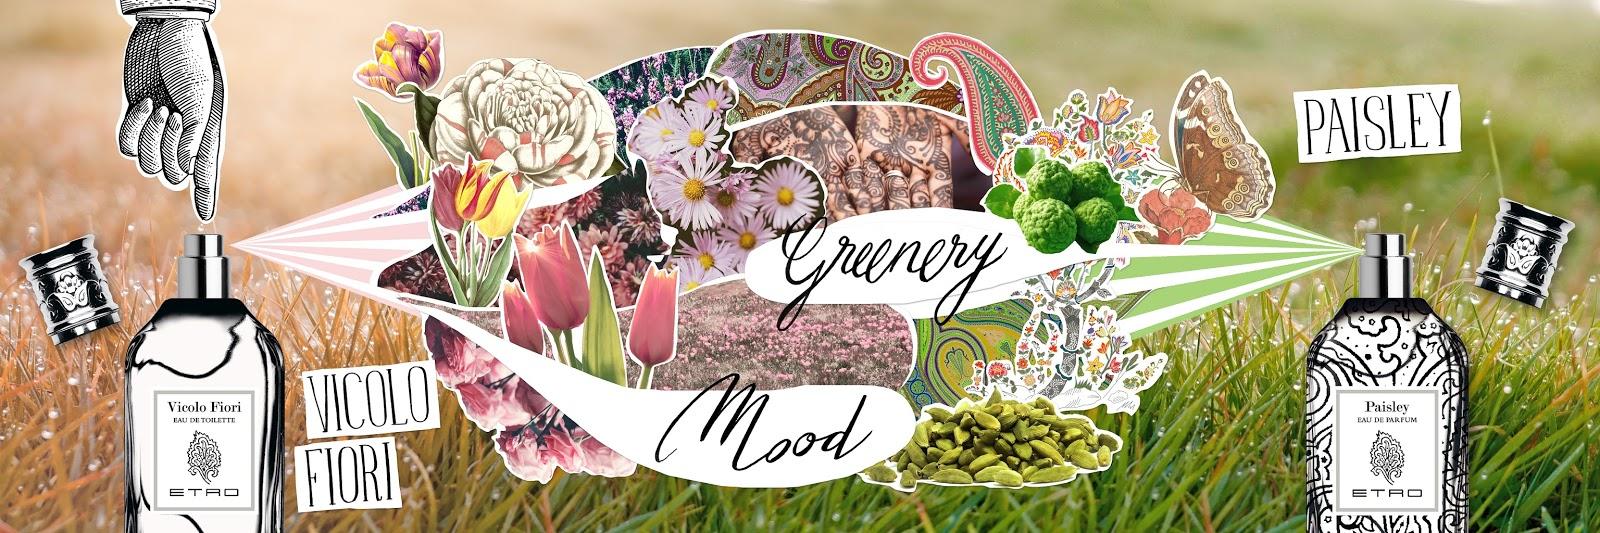 Etro Metamorfosi Greenery Mood